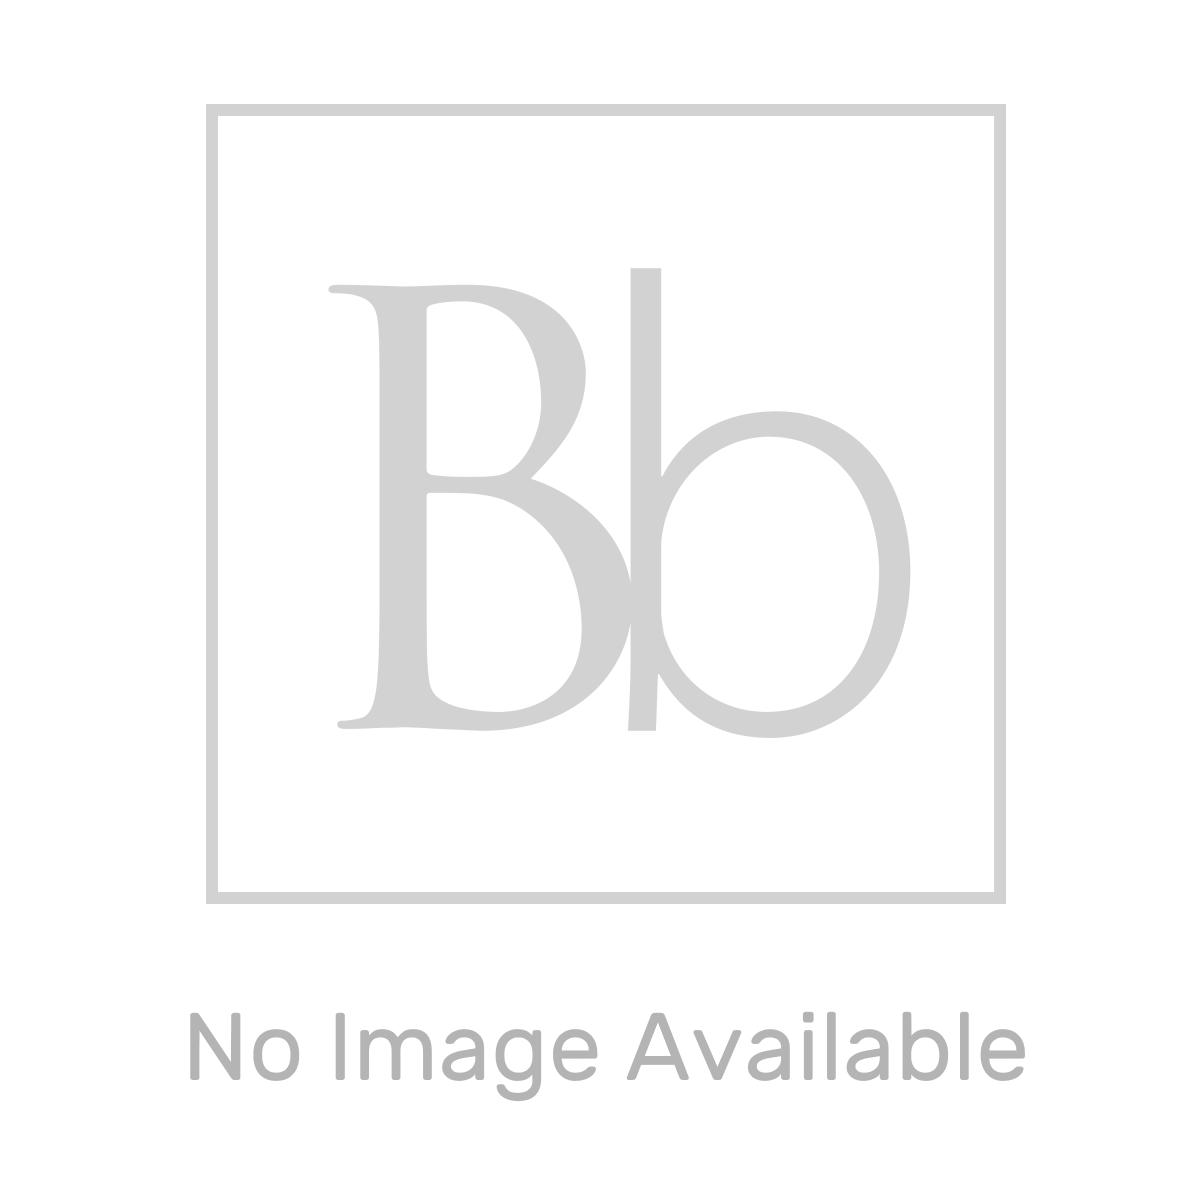 Croydex White PVC Shower Curtain